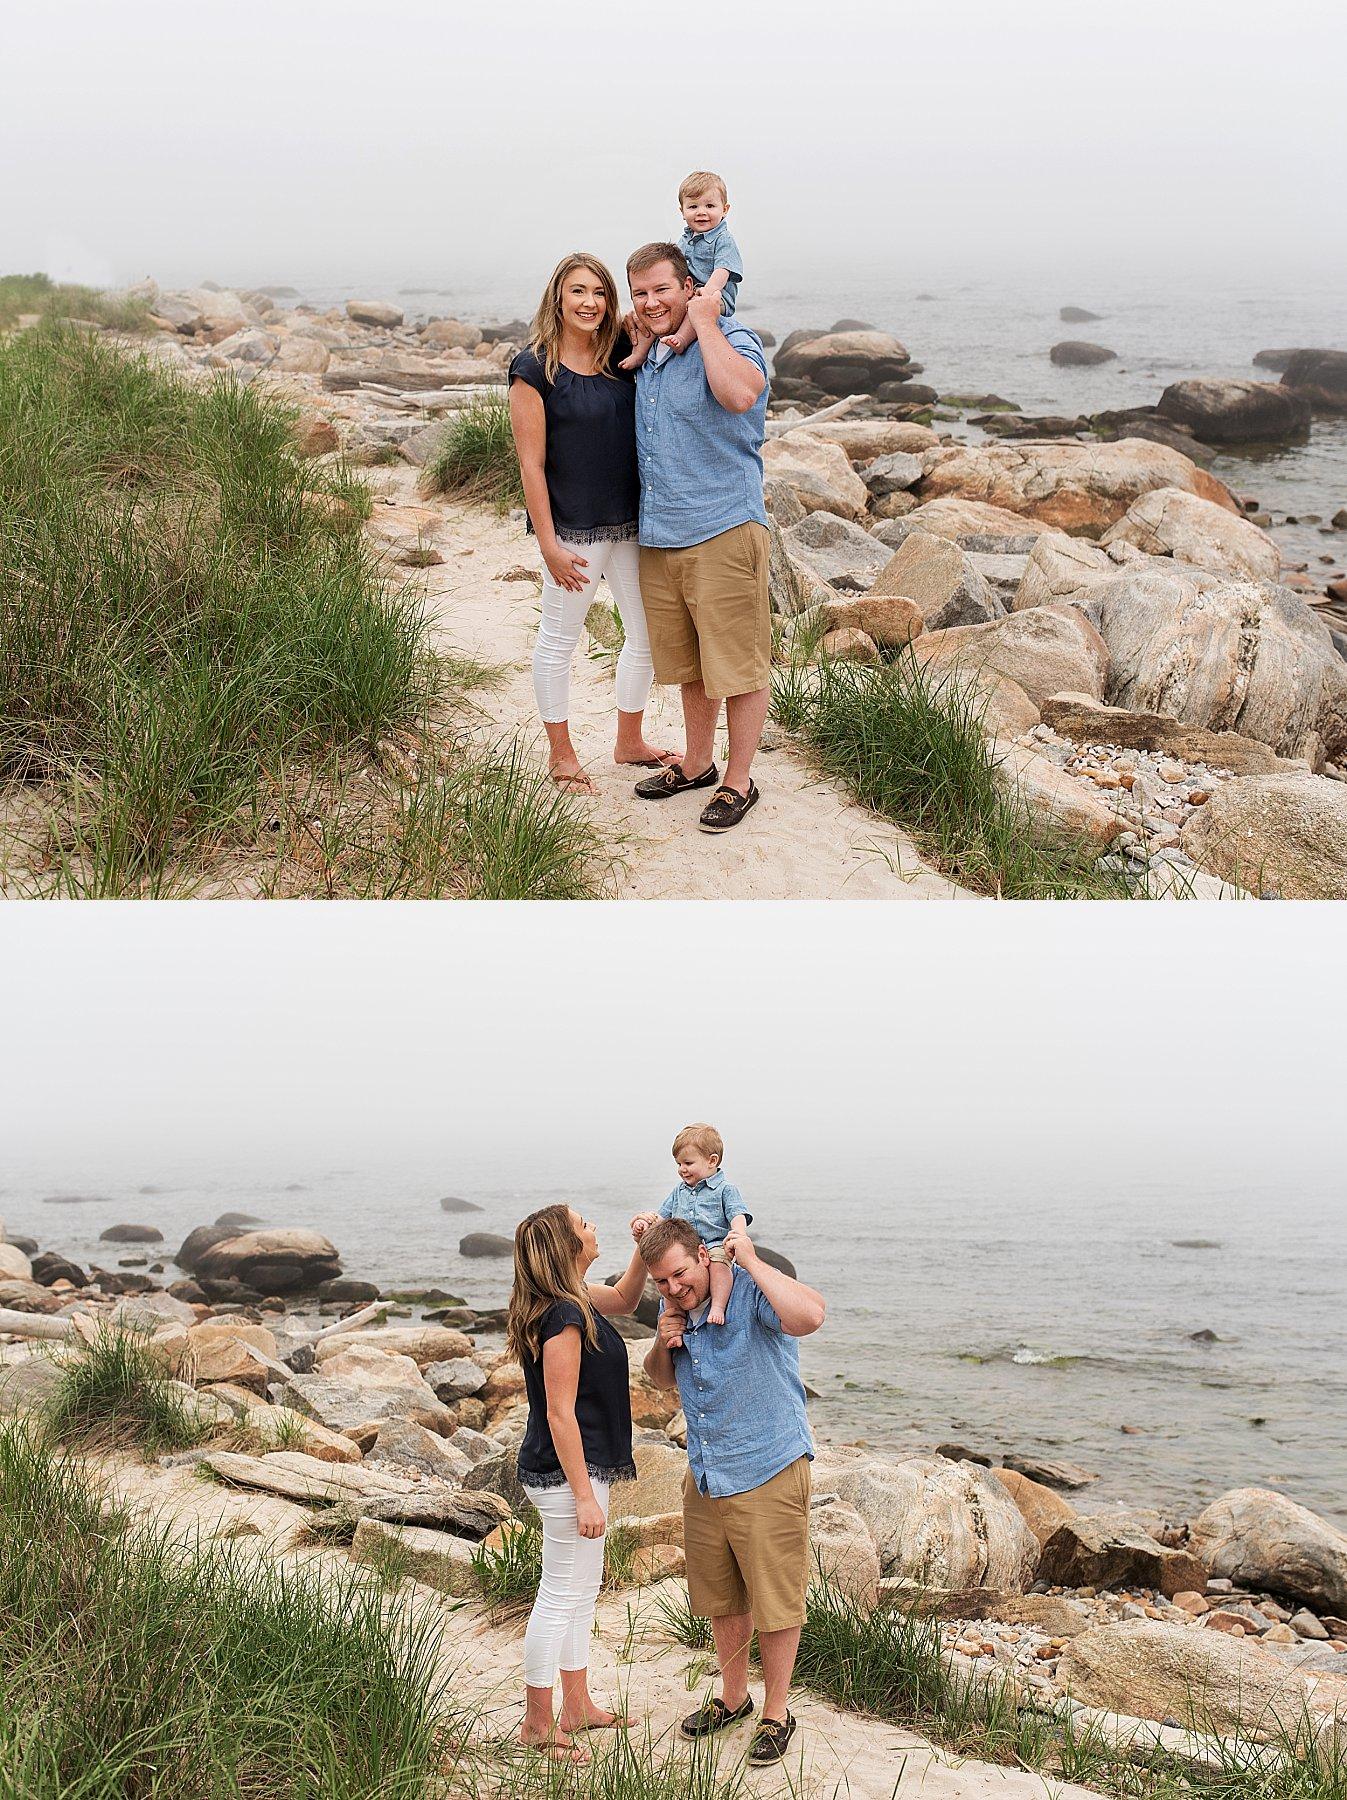 CT family portrait photographer